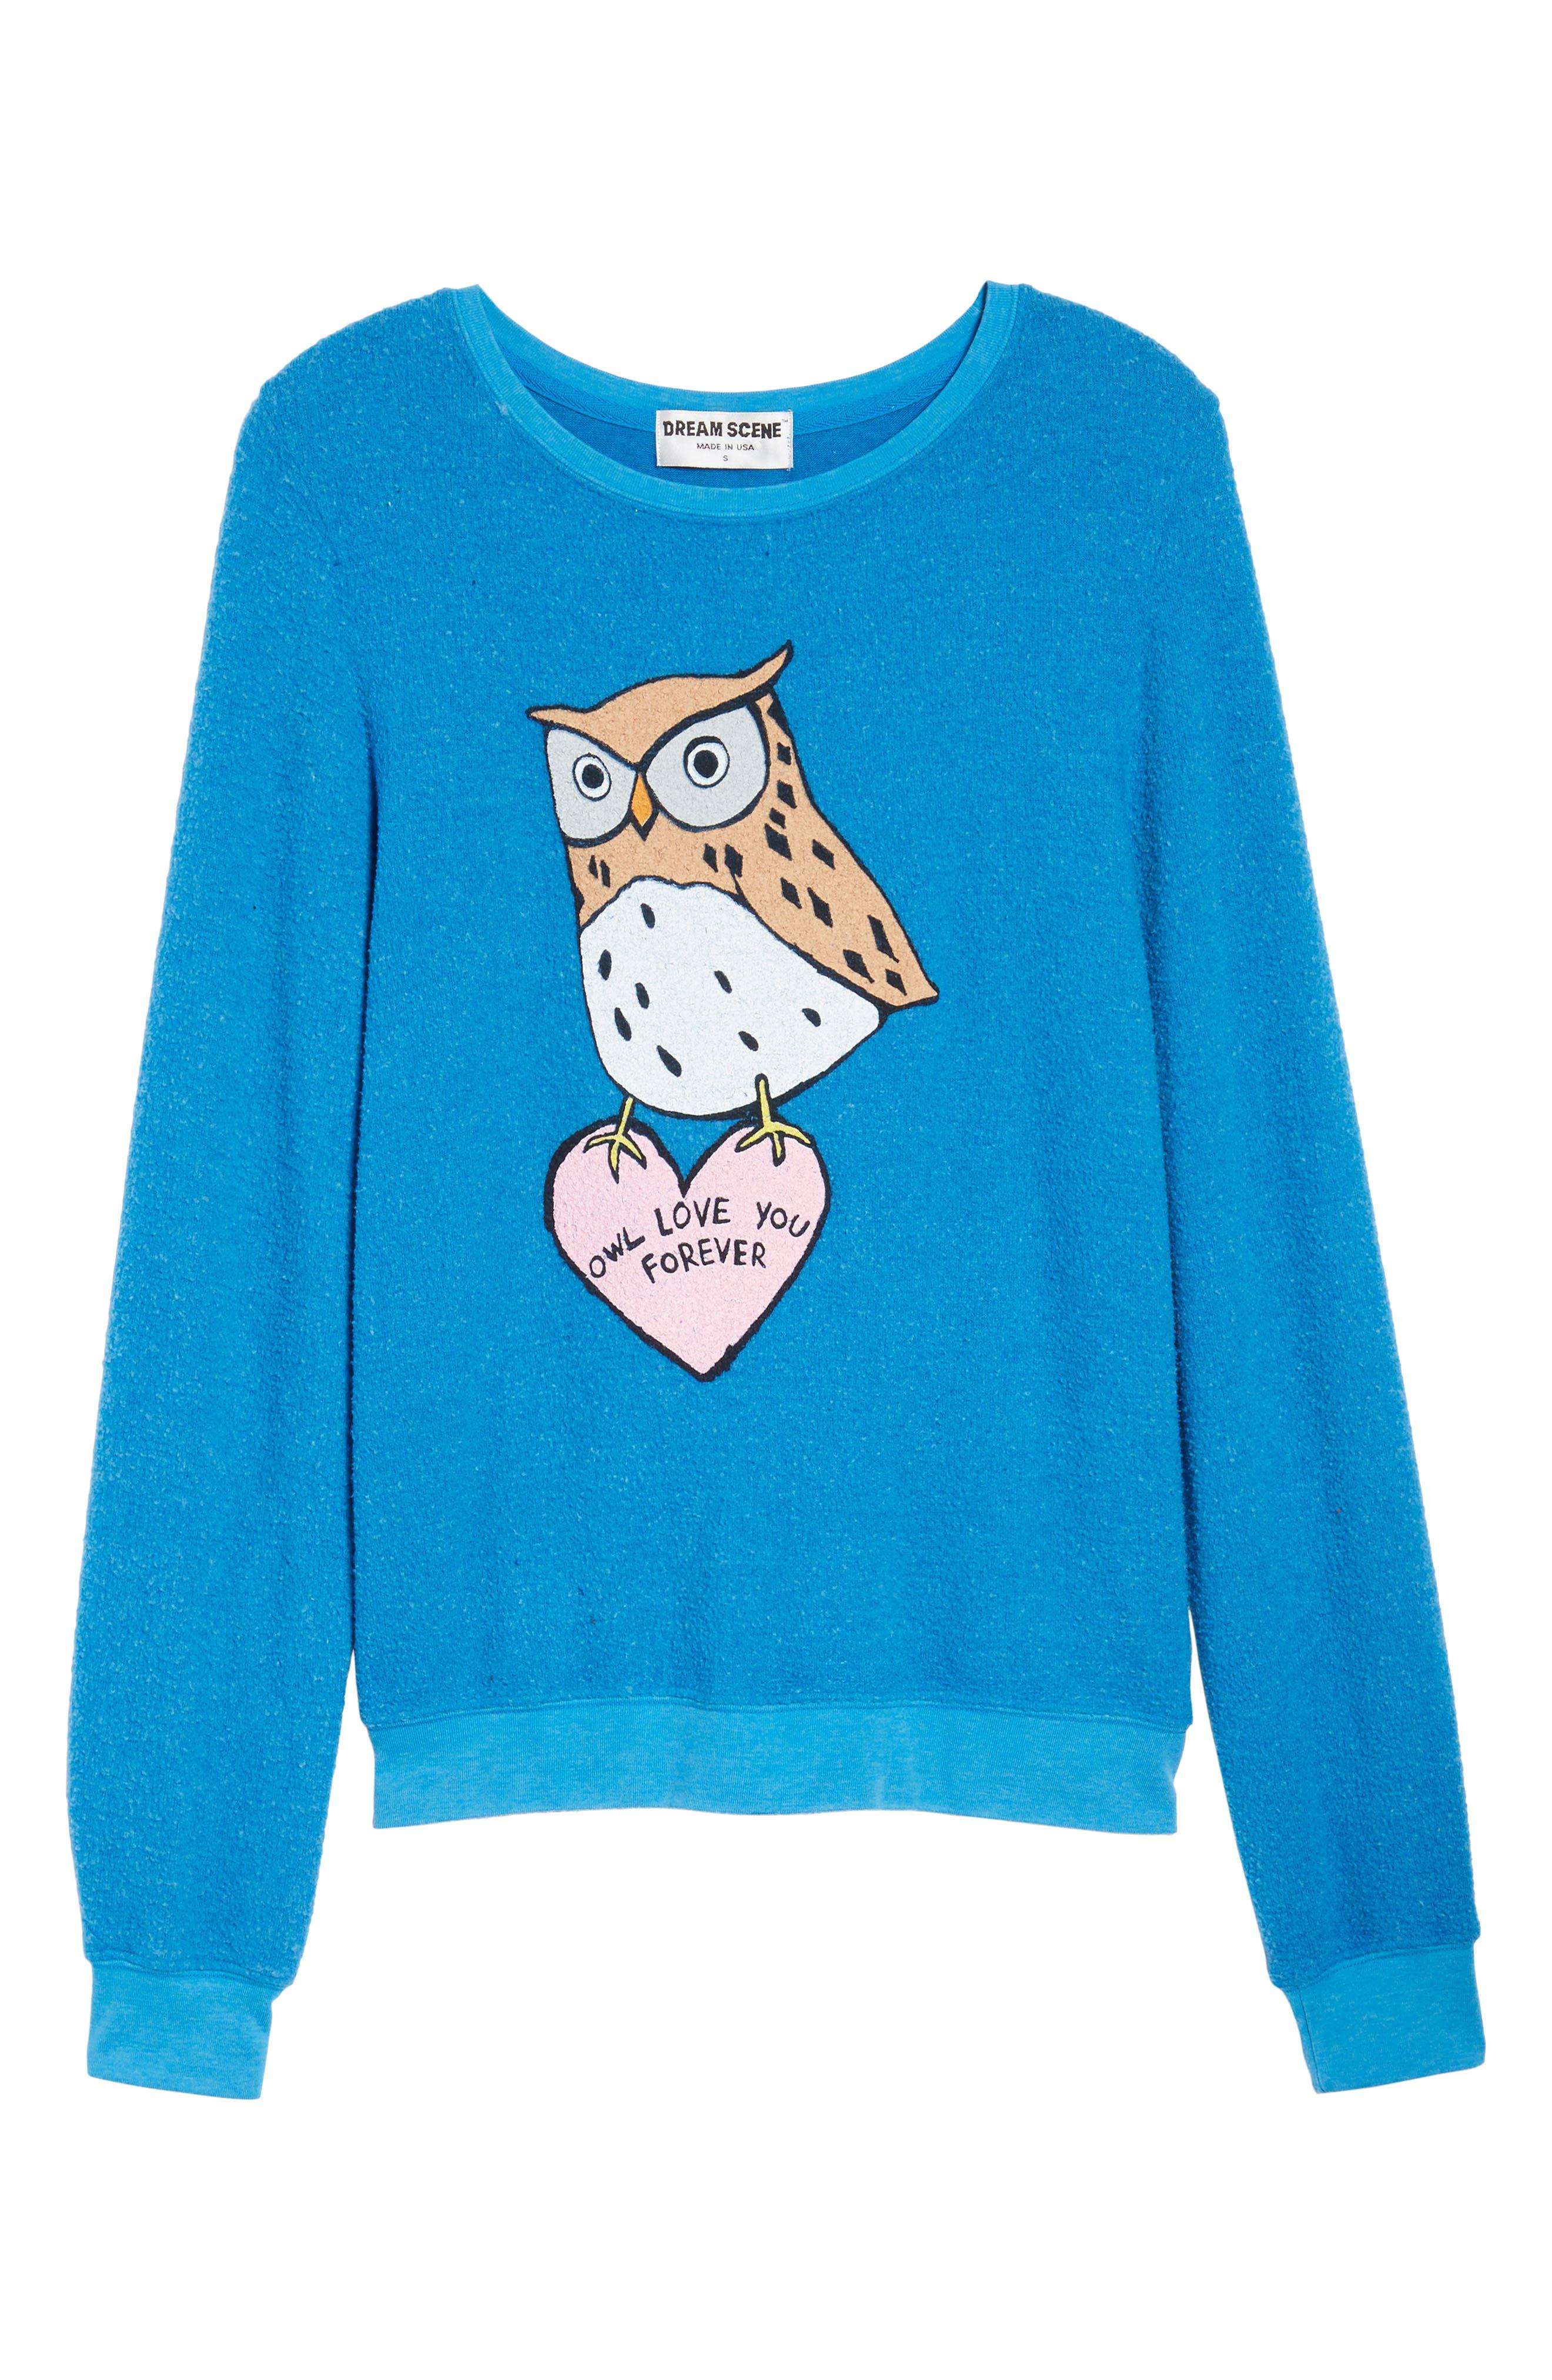 Owl Love You Forever Sweatshirt,                             Alternate thumbnail 6, color,                             401